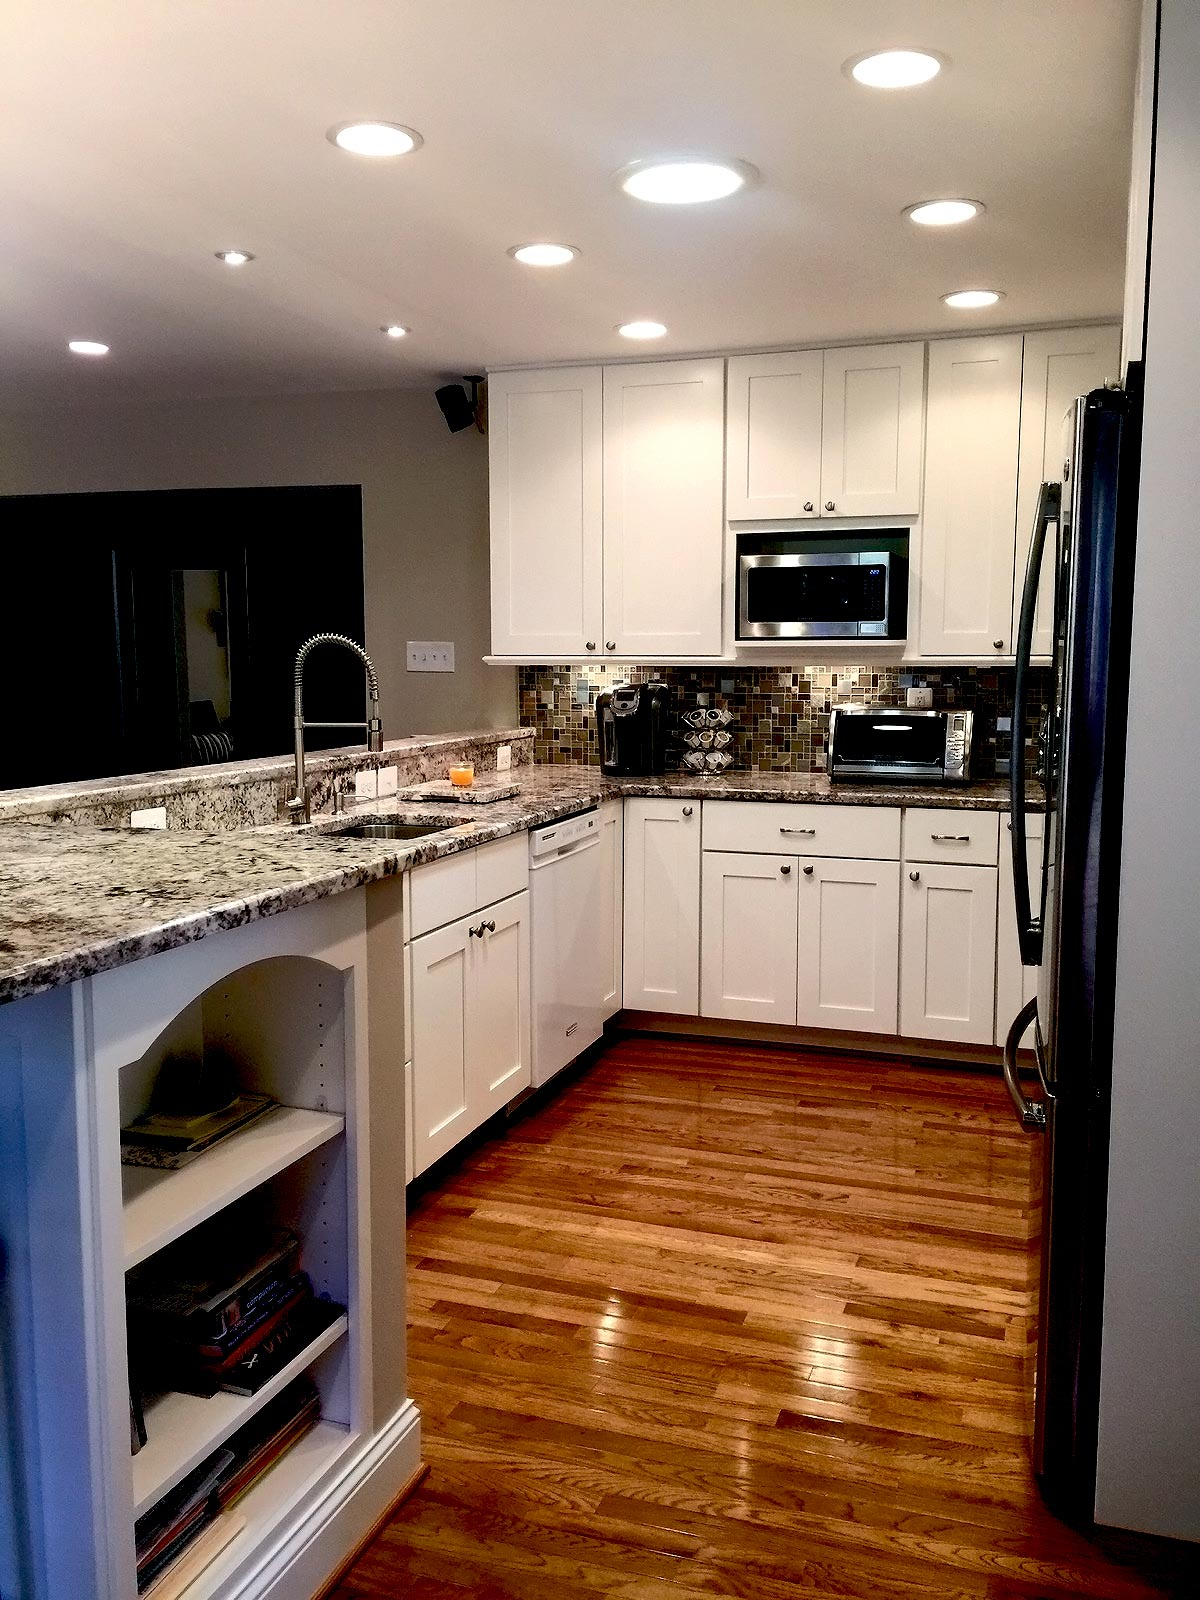 kitchen remodeling fairfax va flush mount light bath remodel in bianco renovations after